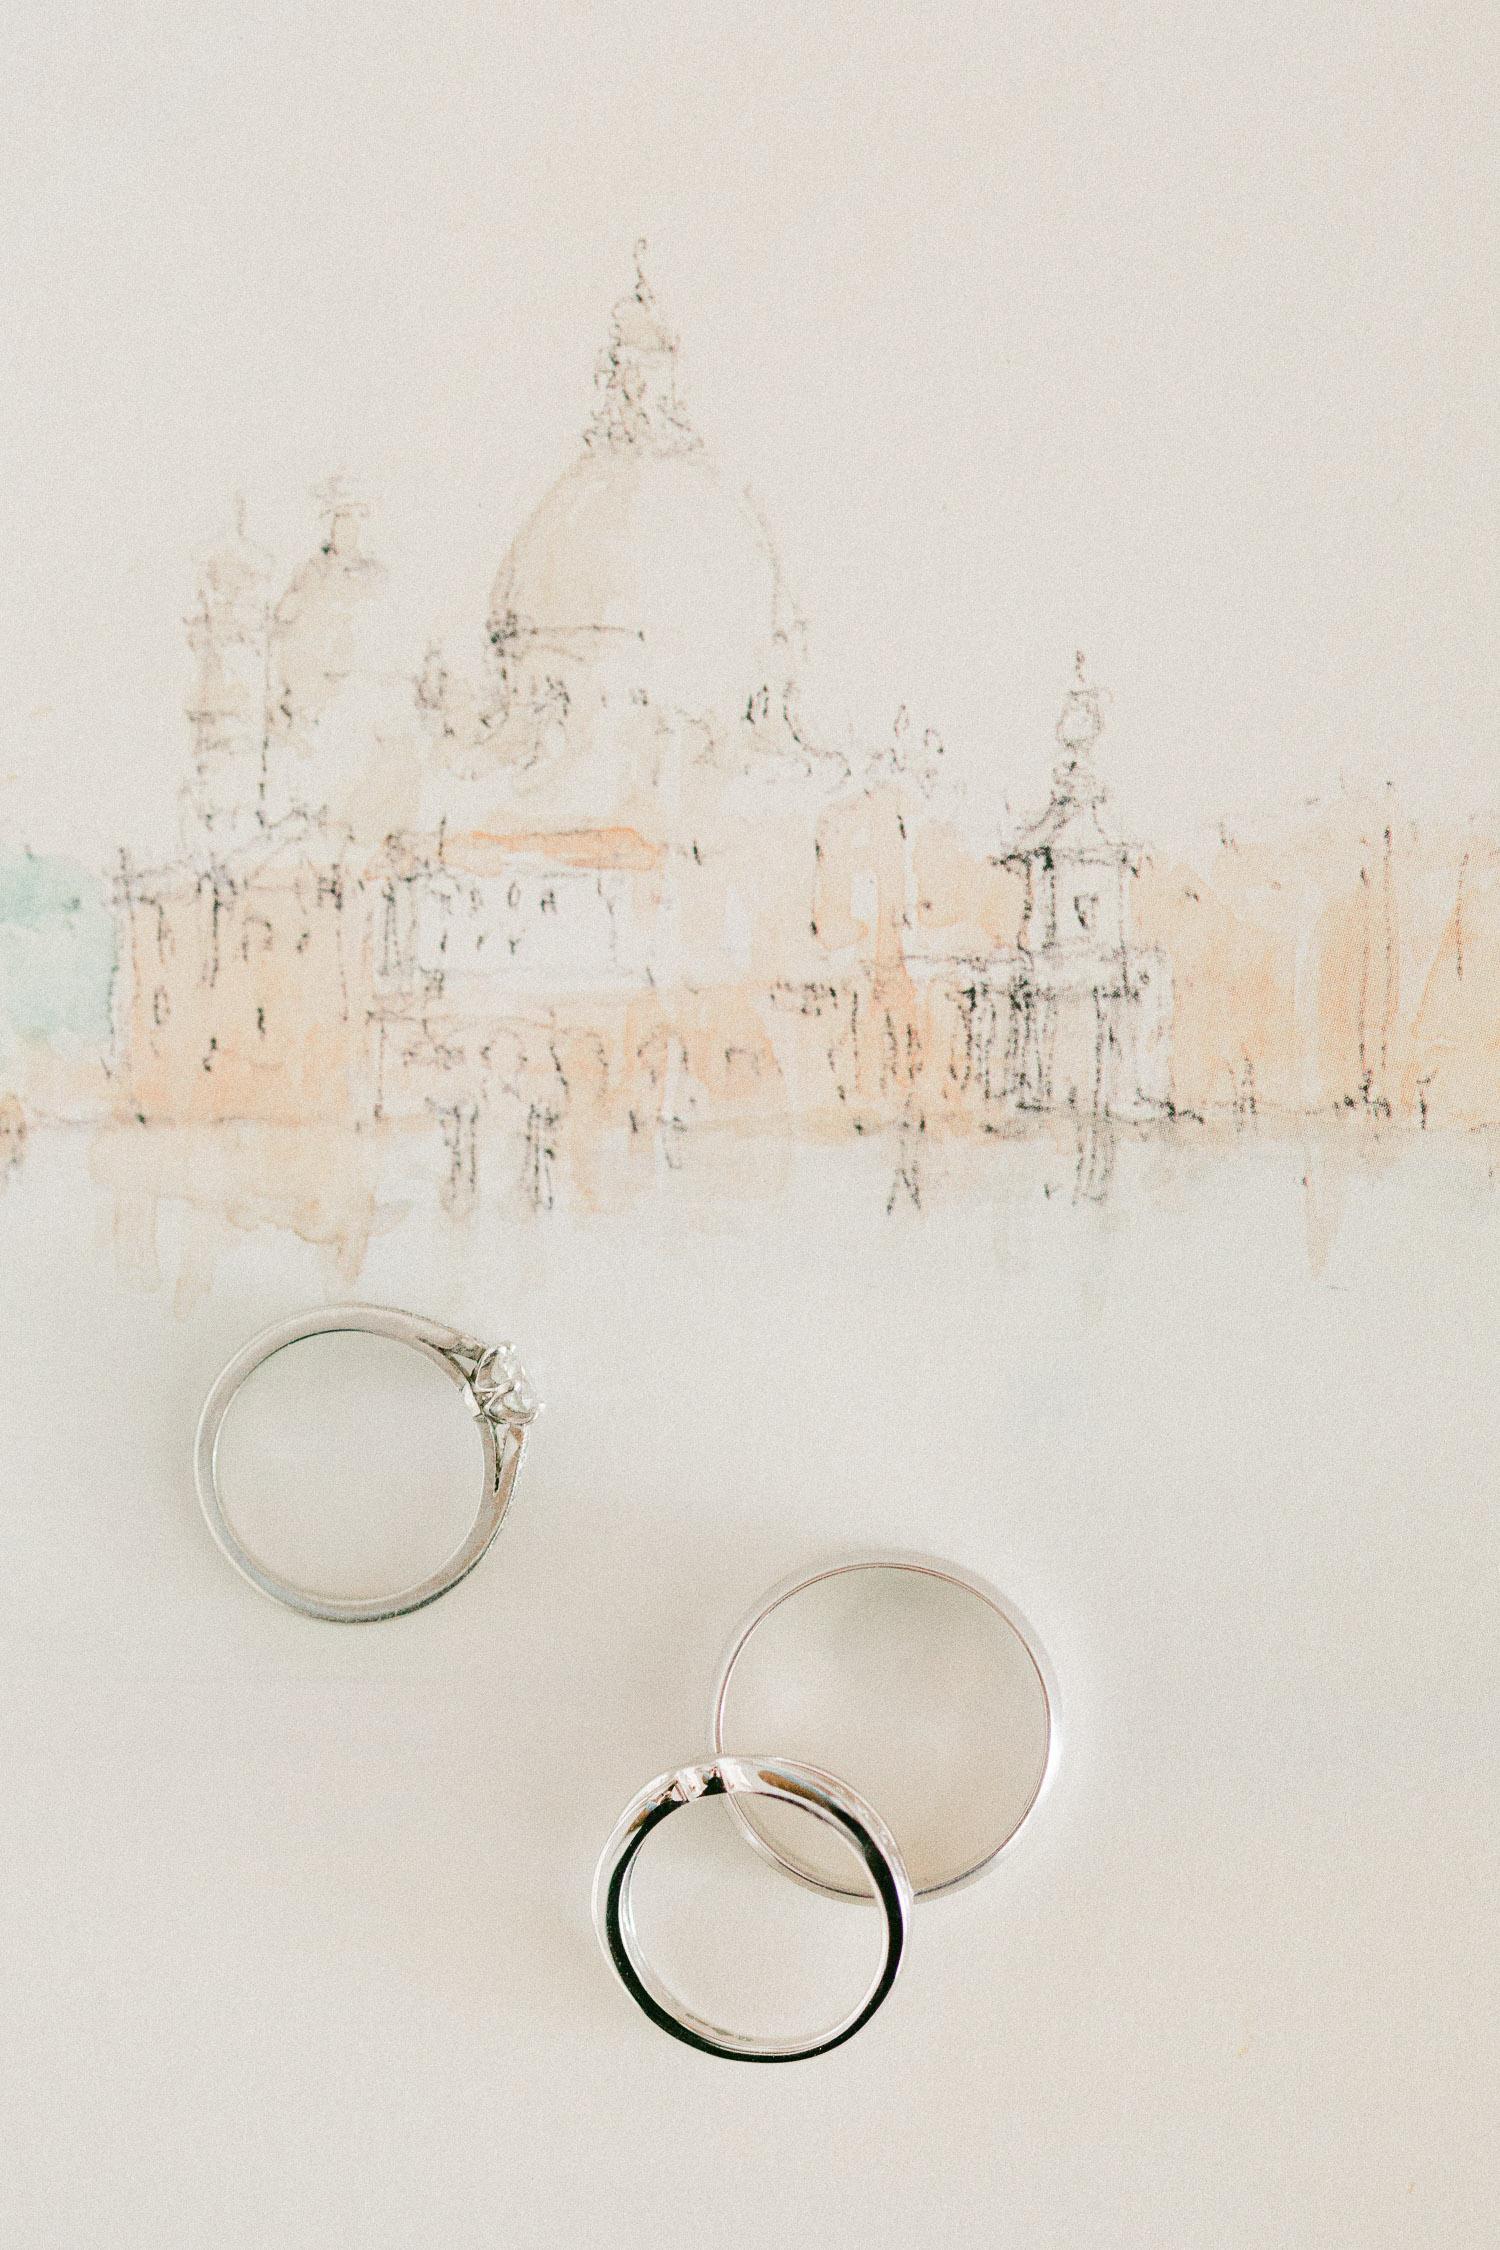 Bridal round halo engagement ring and minimal wedding rings artwork flat-lay